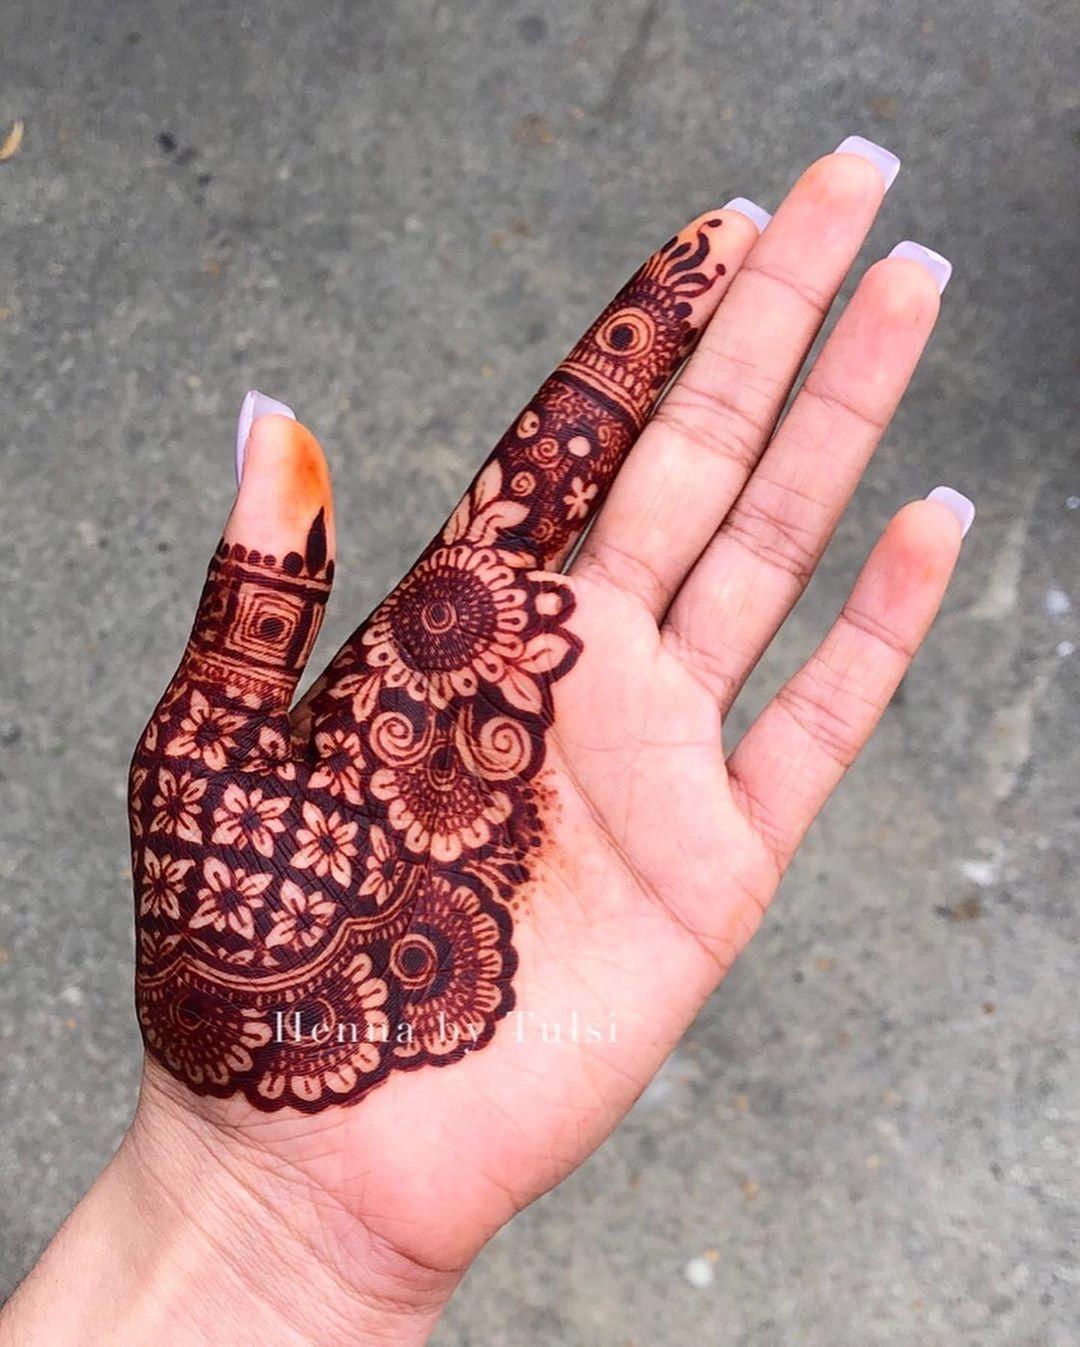 Throwback to this awesome wrap-around design I did. i still can't sleep! @nshennaco  #mehendi #mehndi #hennalove #henna #weddings #art #hennartist #feethenna #hennahands #instahenna #hennatattoo #bridalhenna #bridalmehendi #hennadesigns #hennainspire #hennainspo #mehandi #7enna #heena #pakistaniweddings #indianwedding #maharaniweddings #indianweddingbuzz #hennaart #losangeles #mehandidesigns #bridaldesigns #hennabridaldesign @hennainspo_ @awesomemehandi